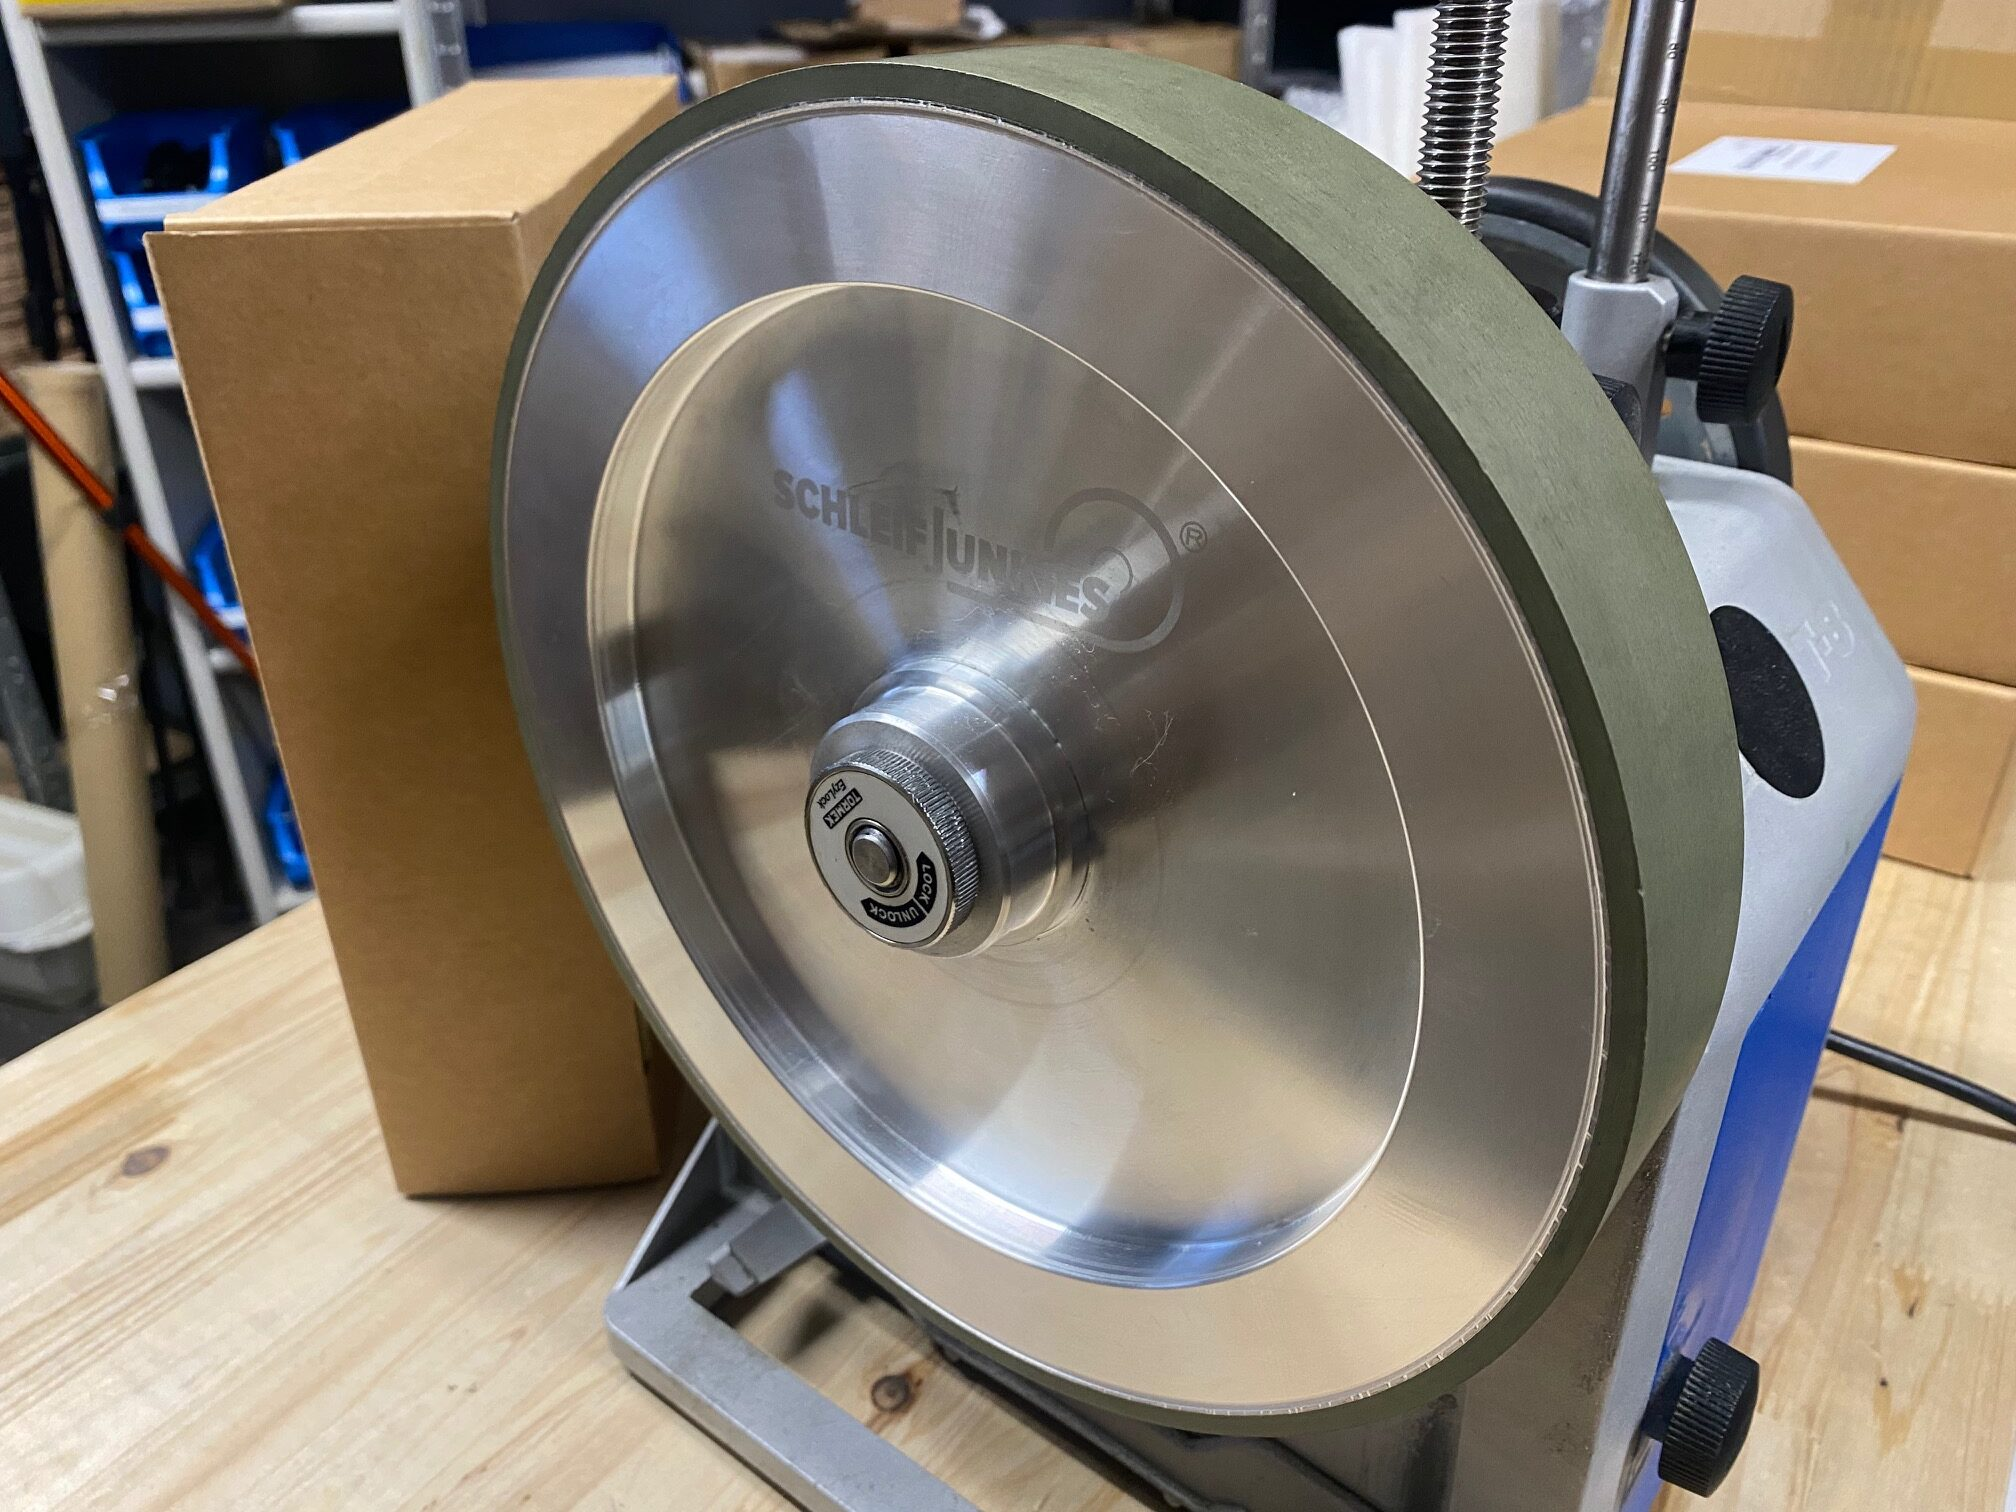 IMG 5544 rotated